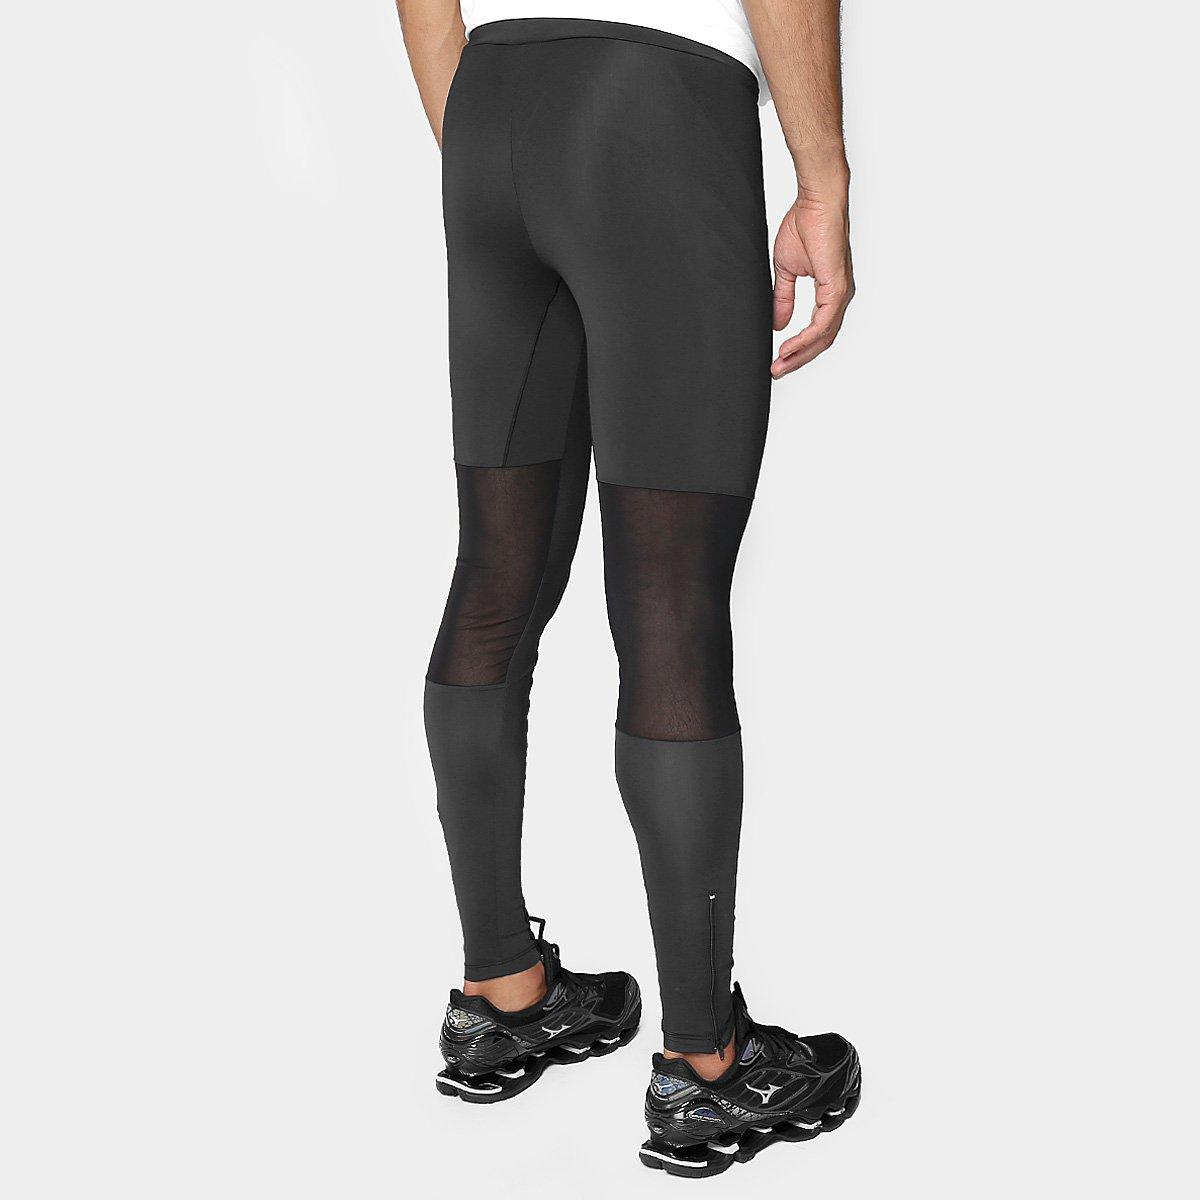 f370fc414b Calça legging de compressão mizuno synchro masculina compre agora jpg  1200x1200 Calca masculina leg